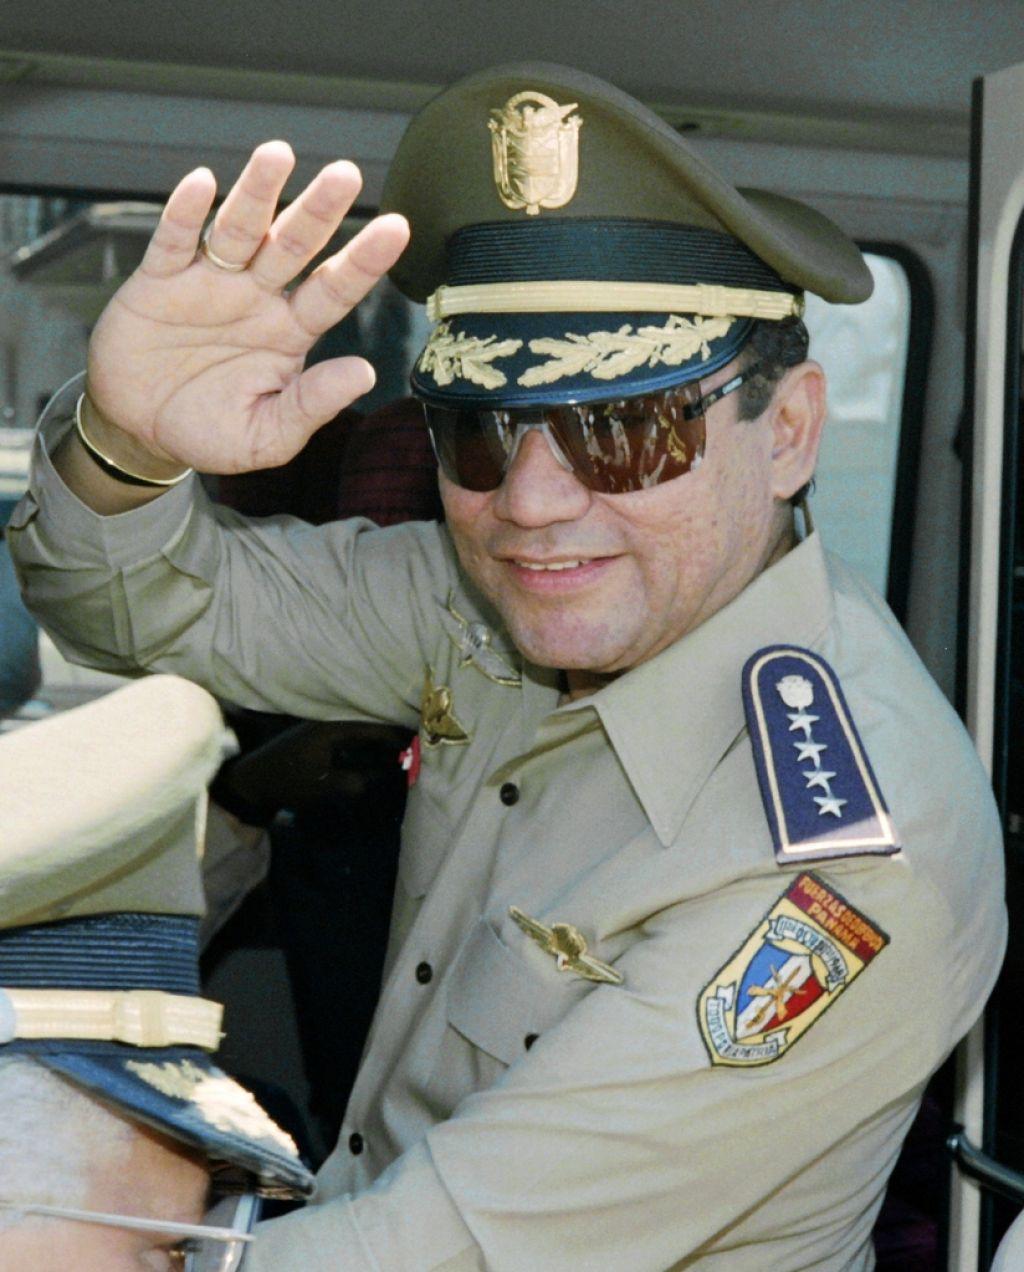 Umrl je nekdanji panamski diktator Manuel Noriega